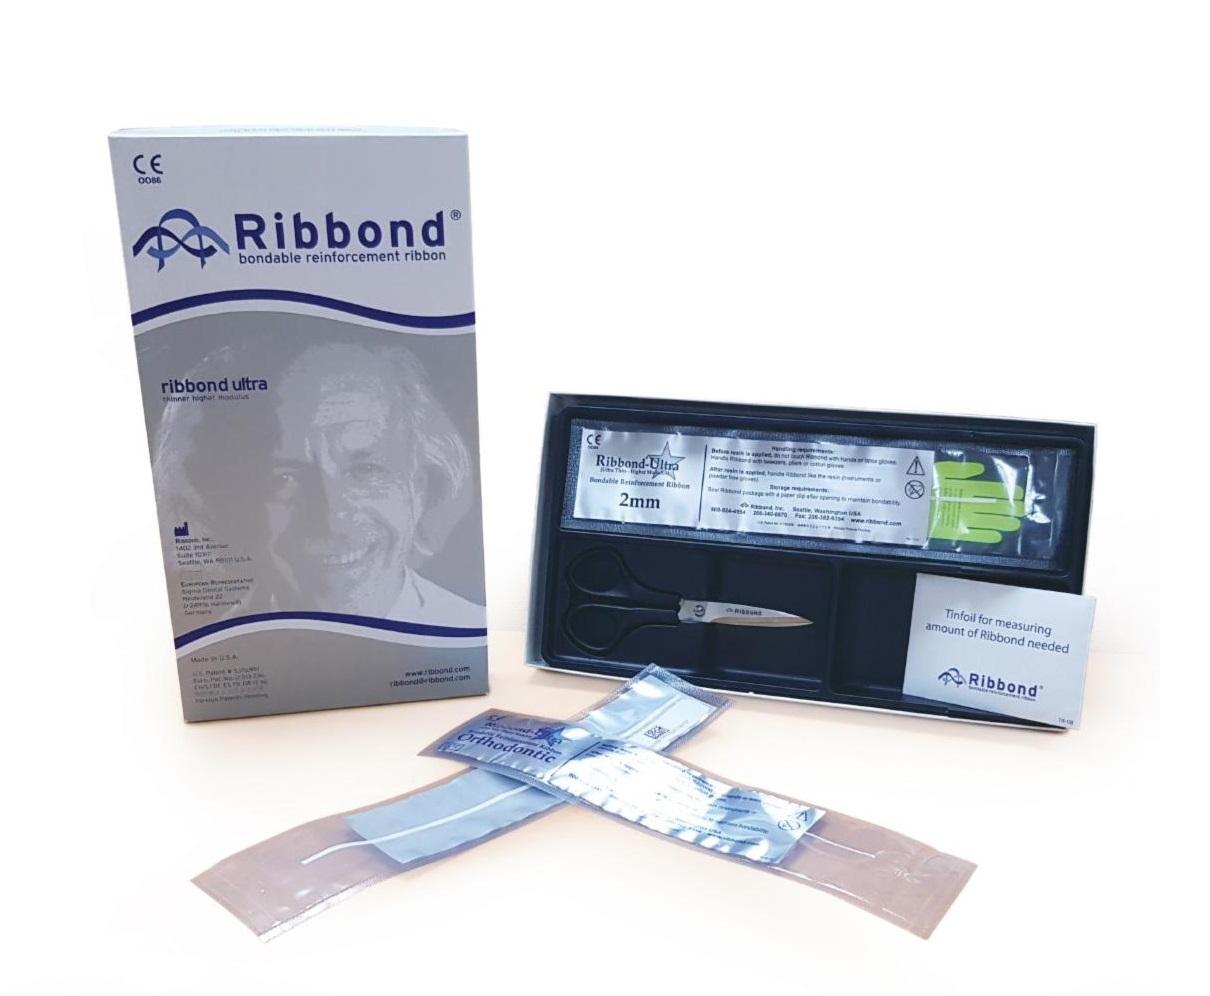 ribbond-ultra (2)